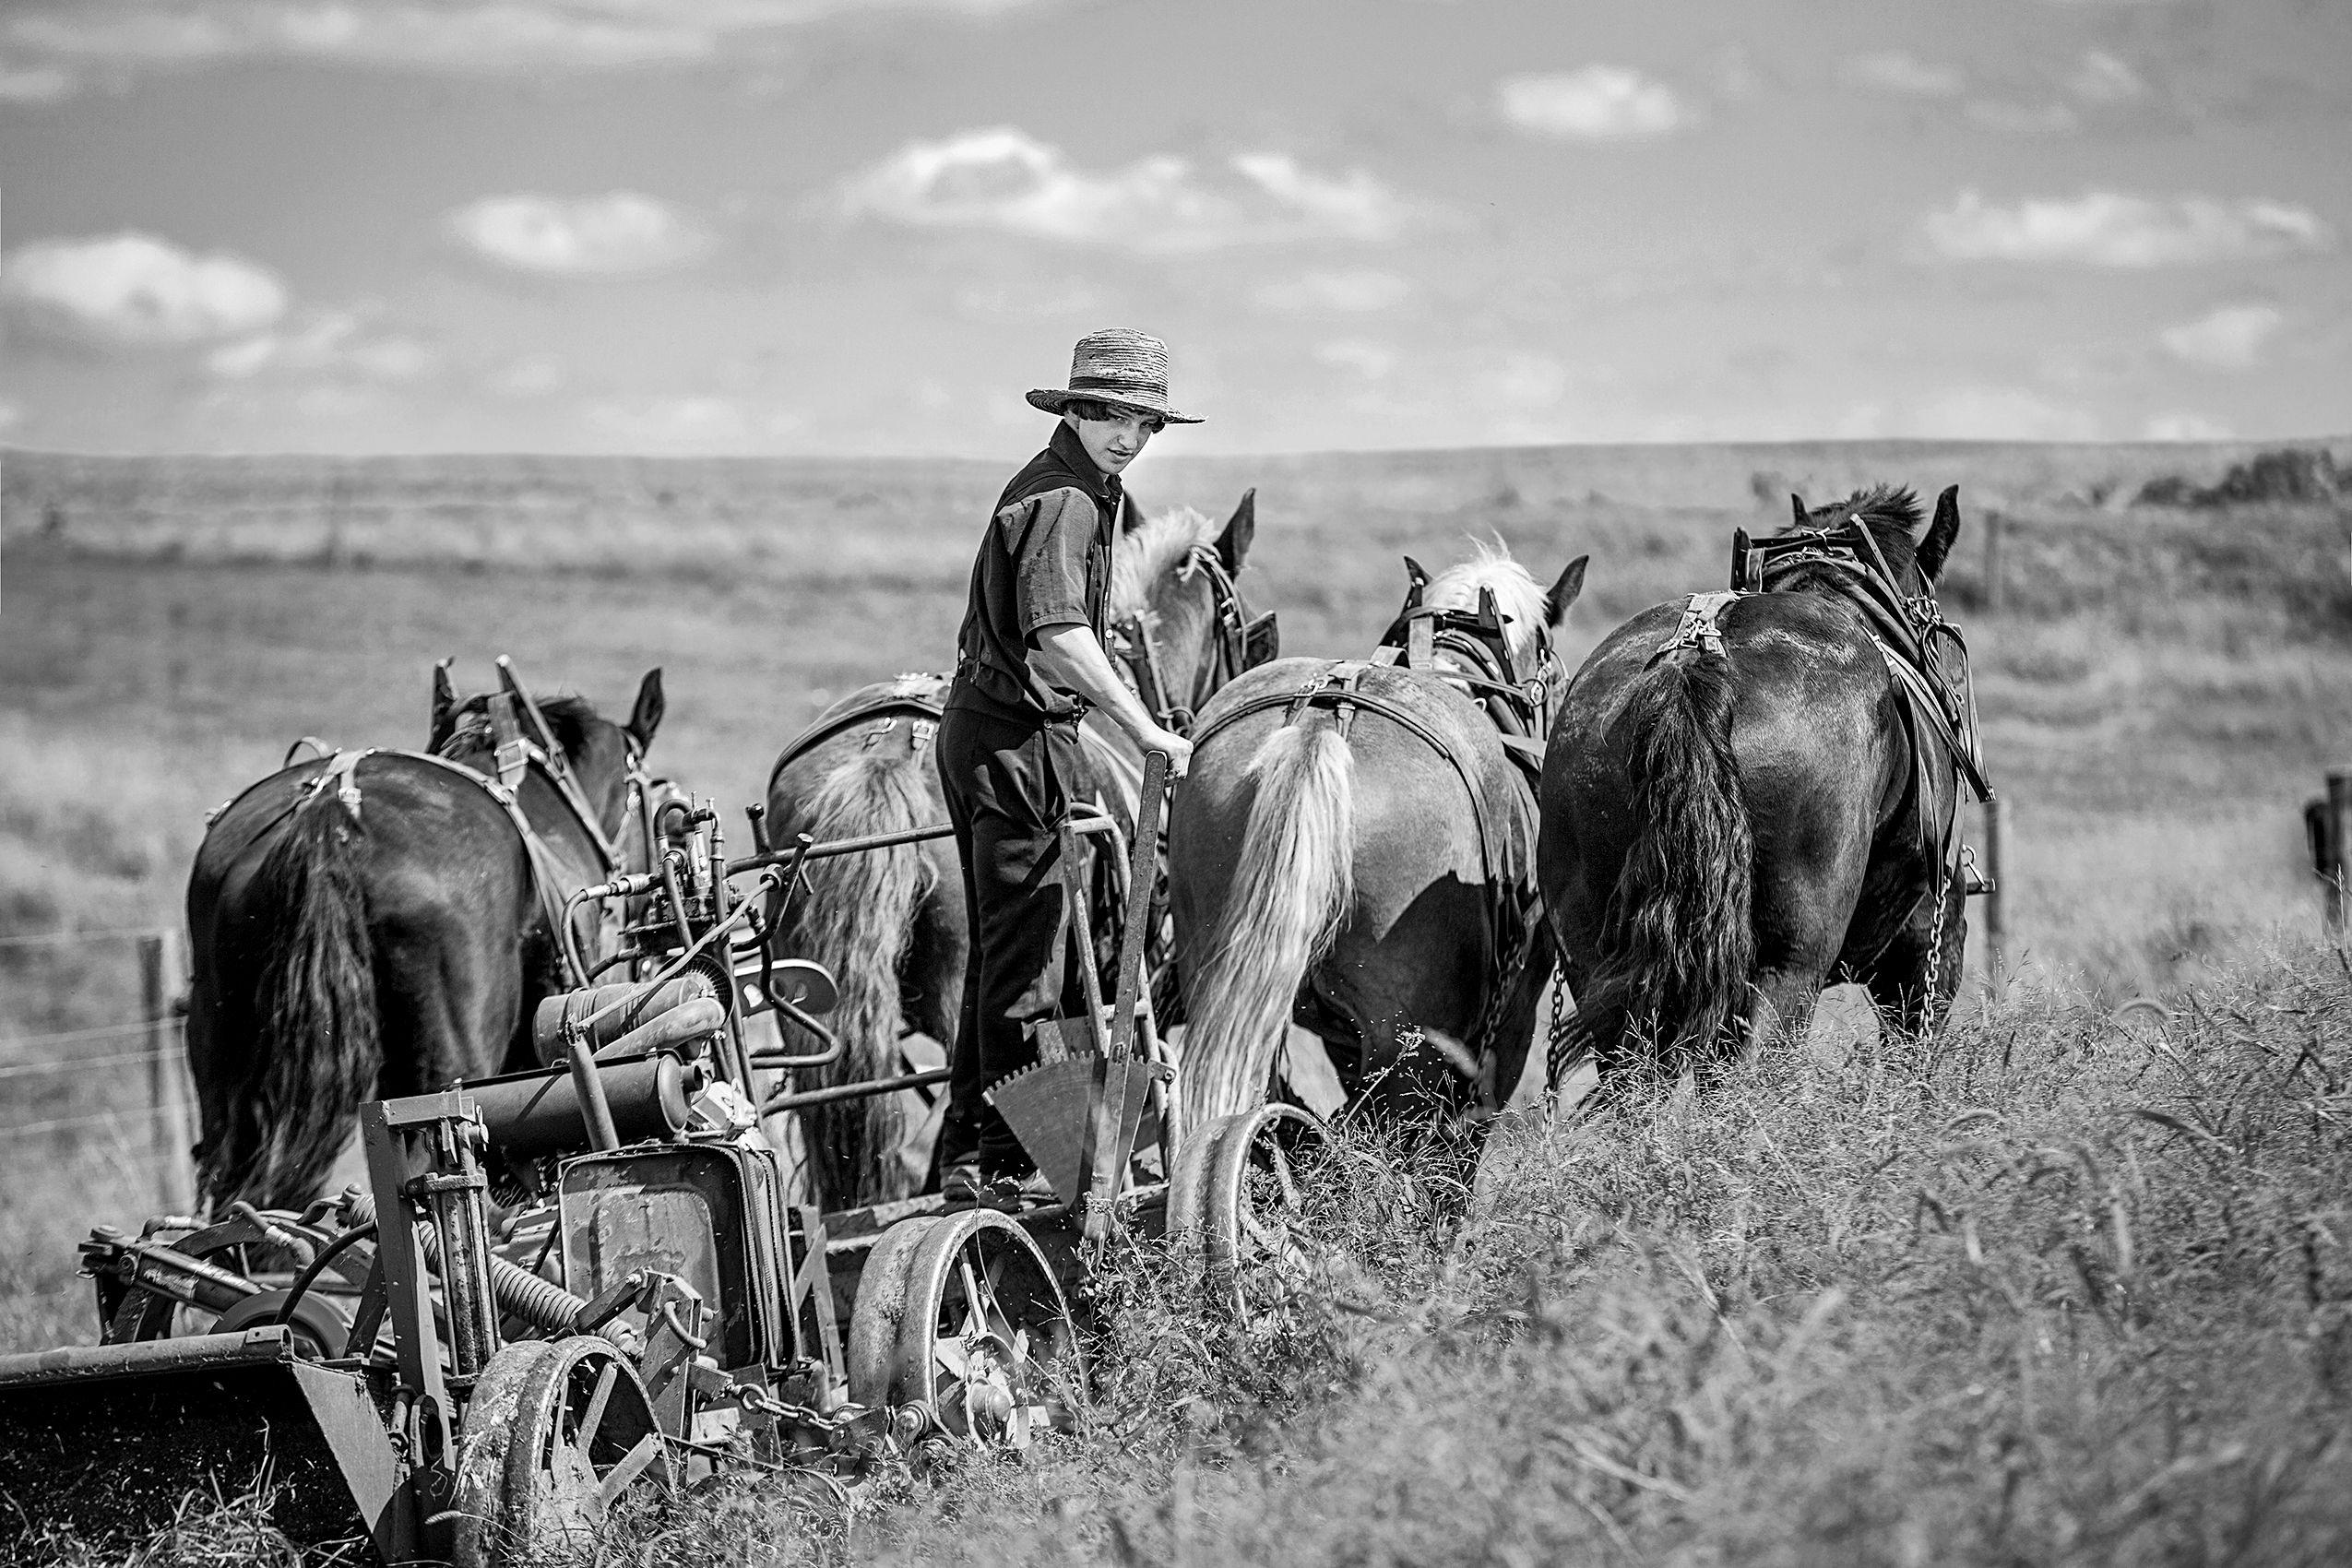 Amish_Boy_HARP8179_BW_FW.jpg